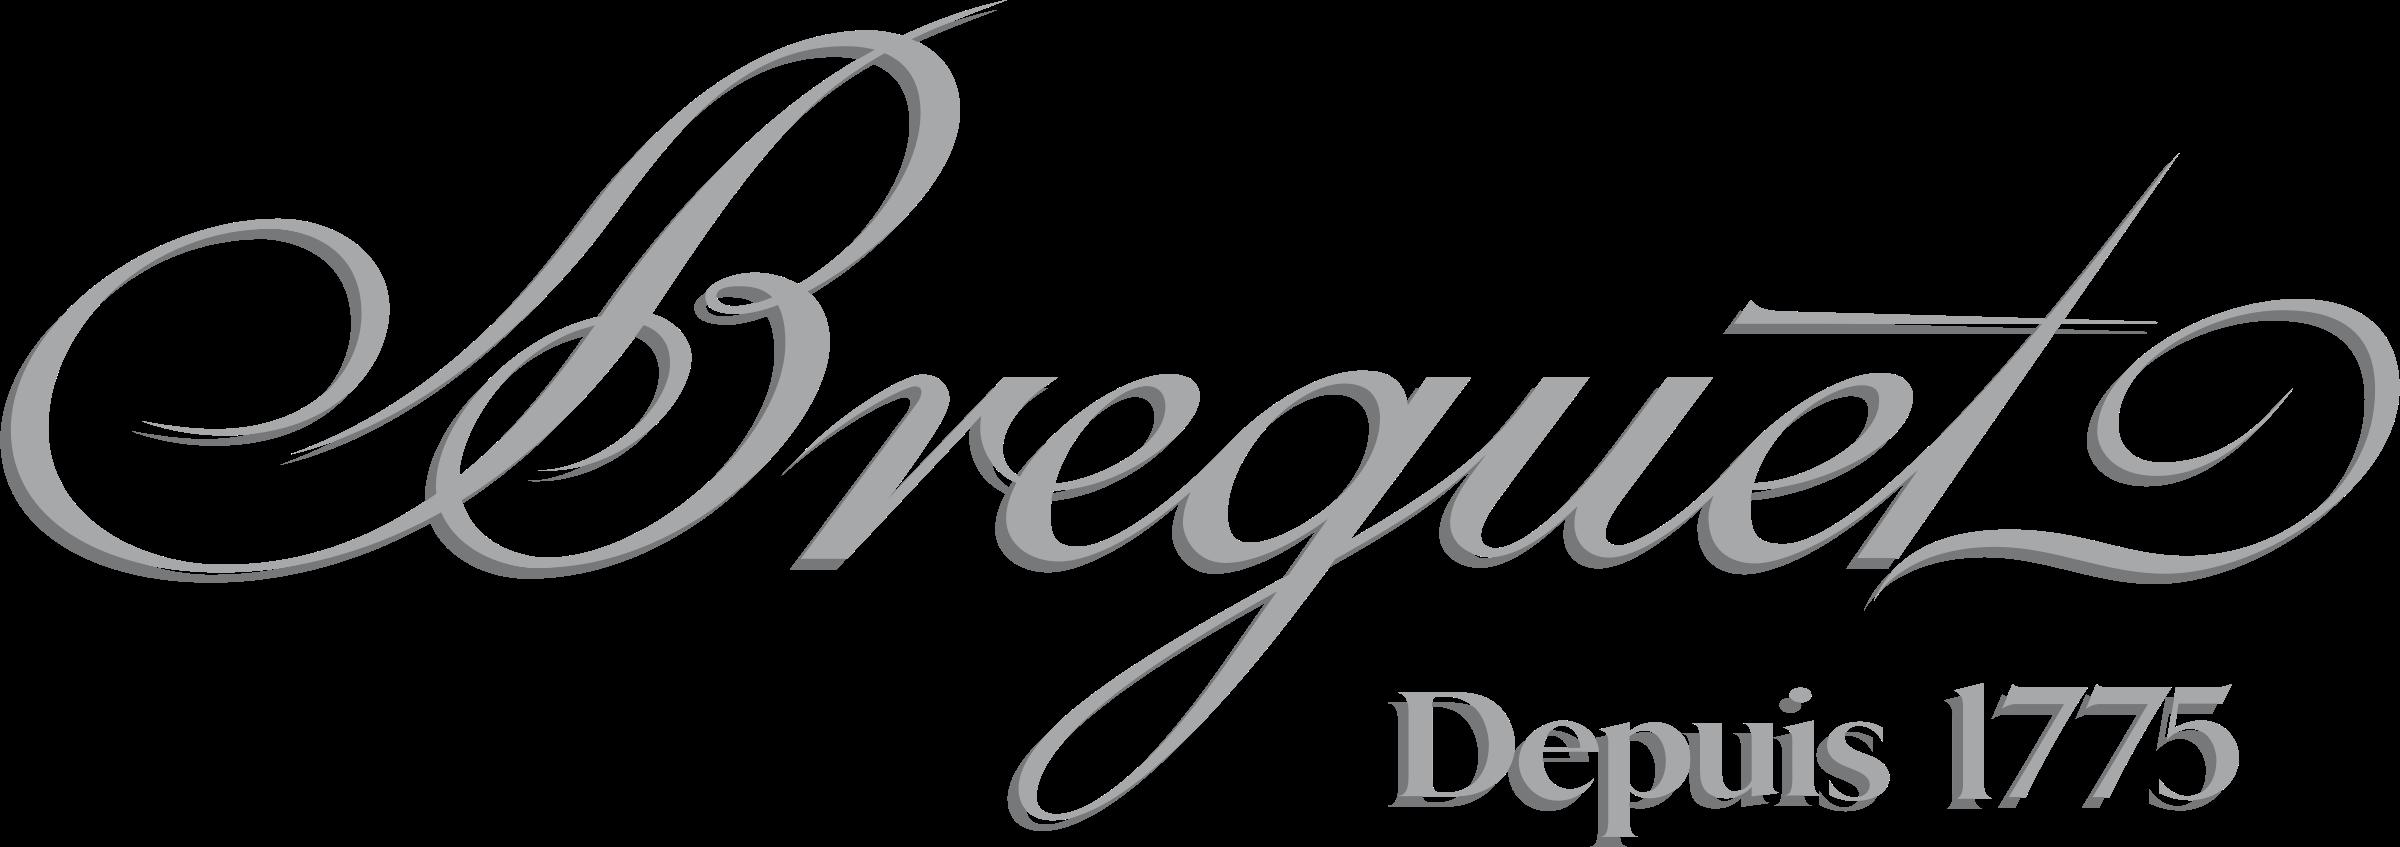 Breguet Logo PNG Transparent & SVG Vector.